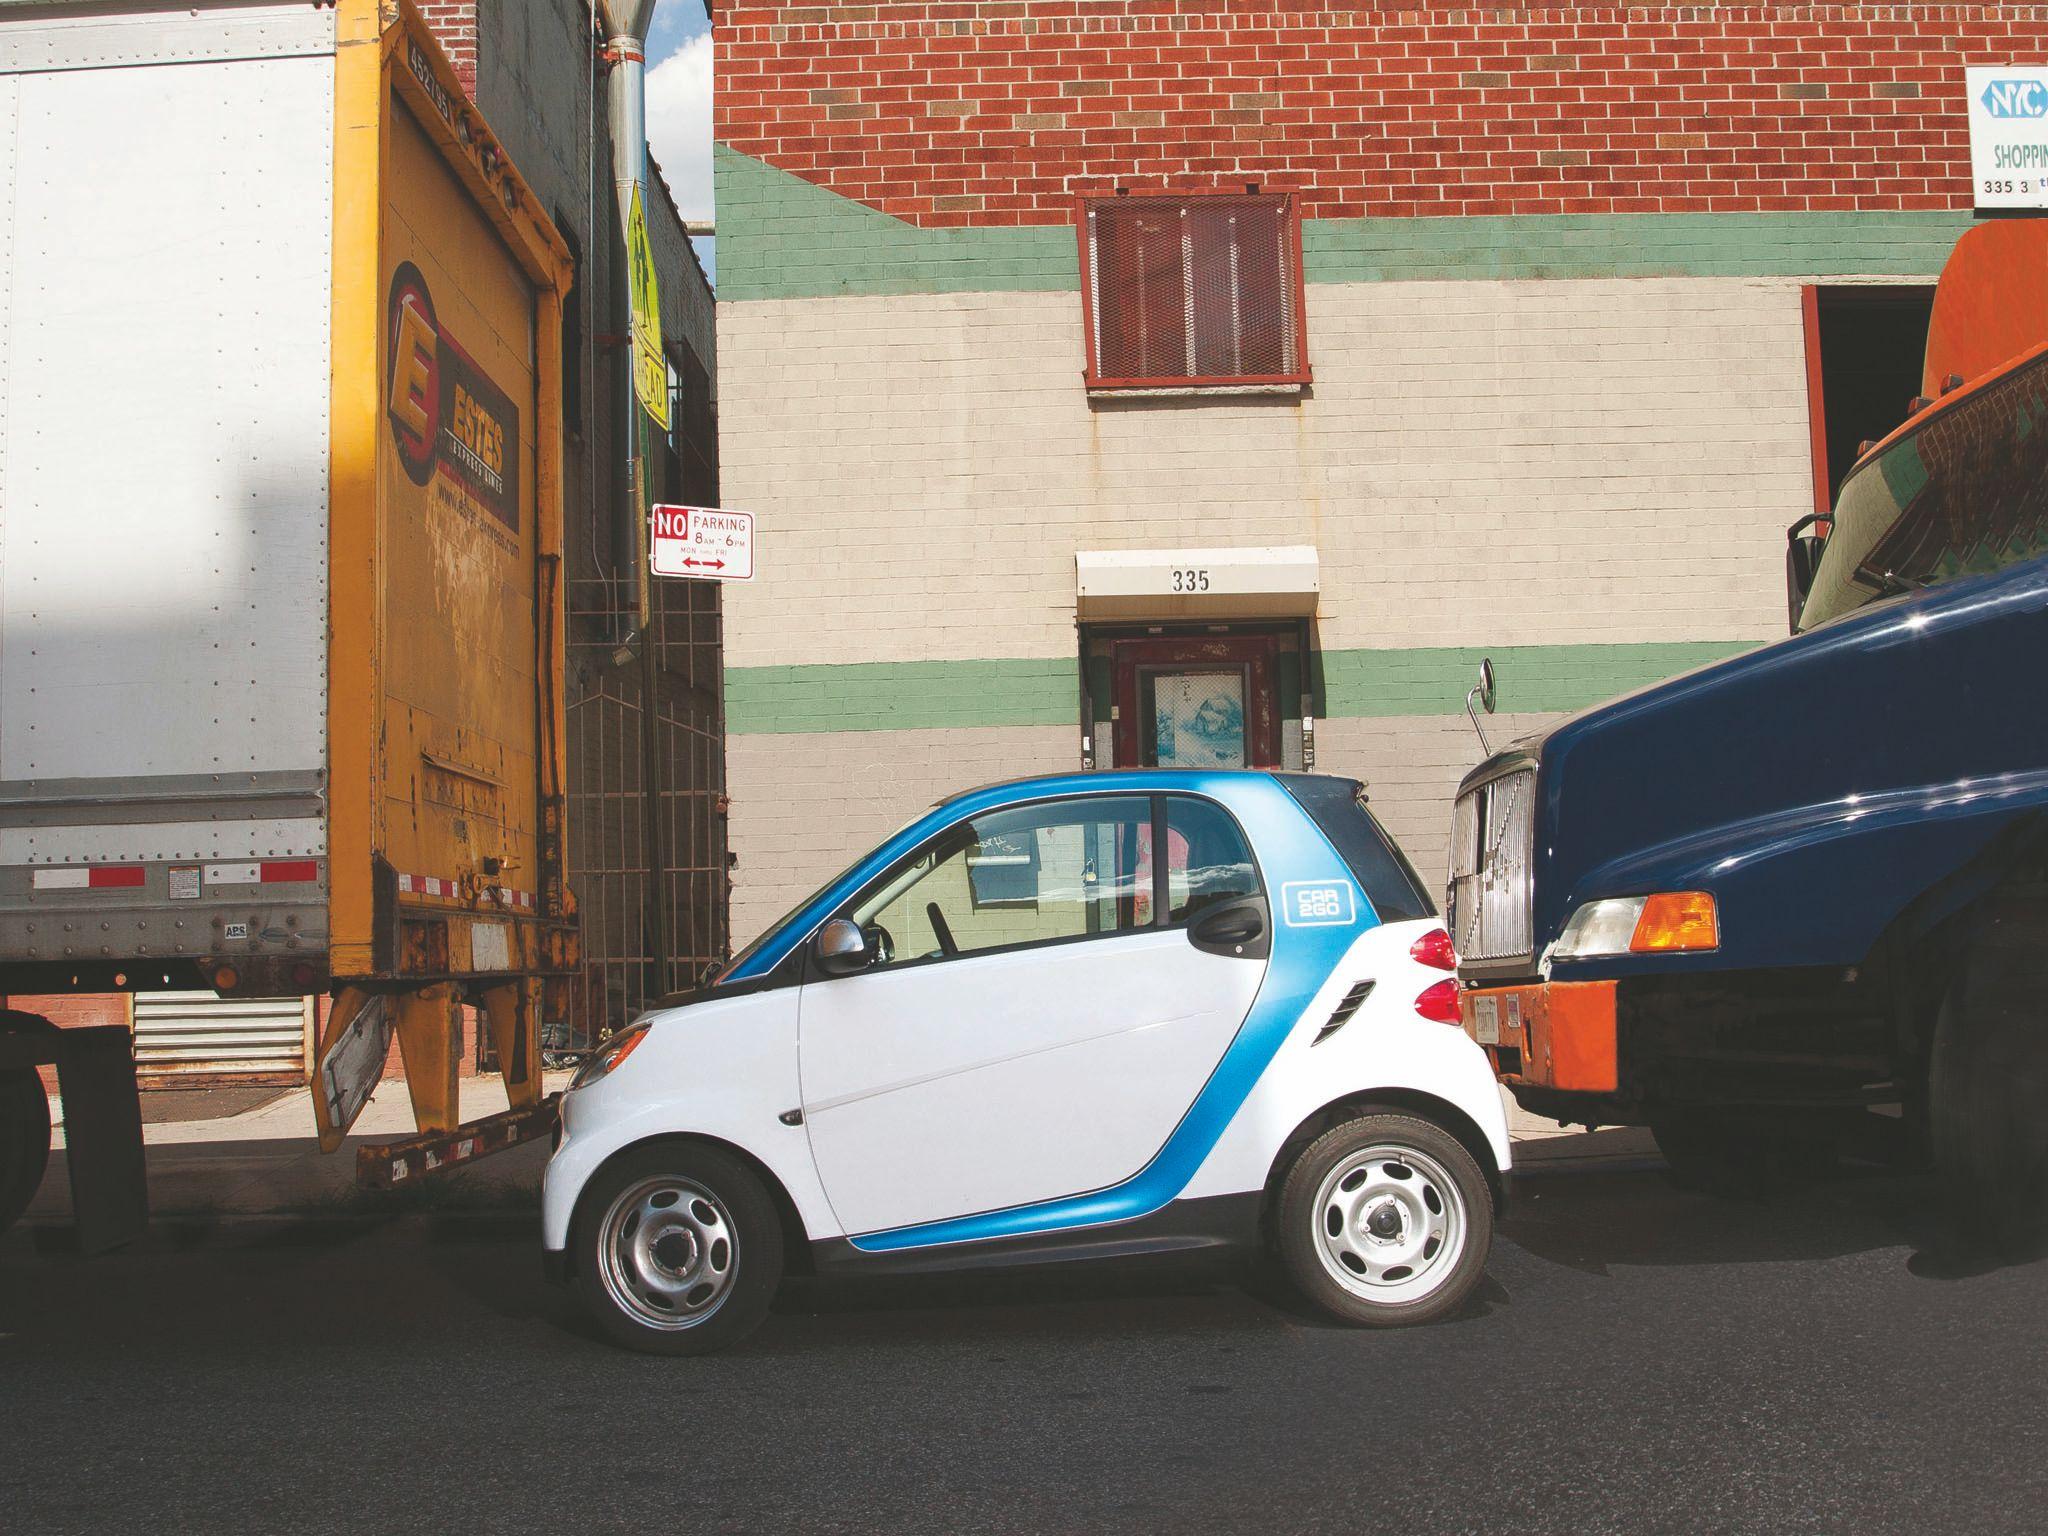 Nyc Alternate Side Parking Calendar 2020 | Calendar For throughout Alternate Side Parking 2022